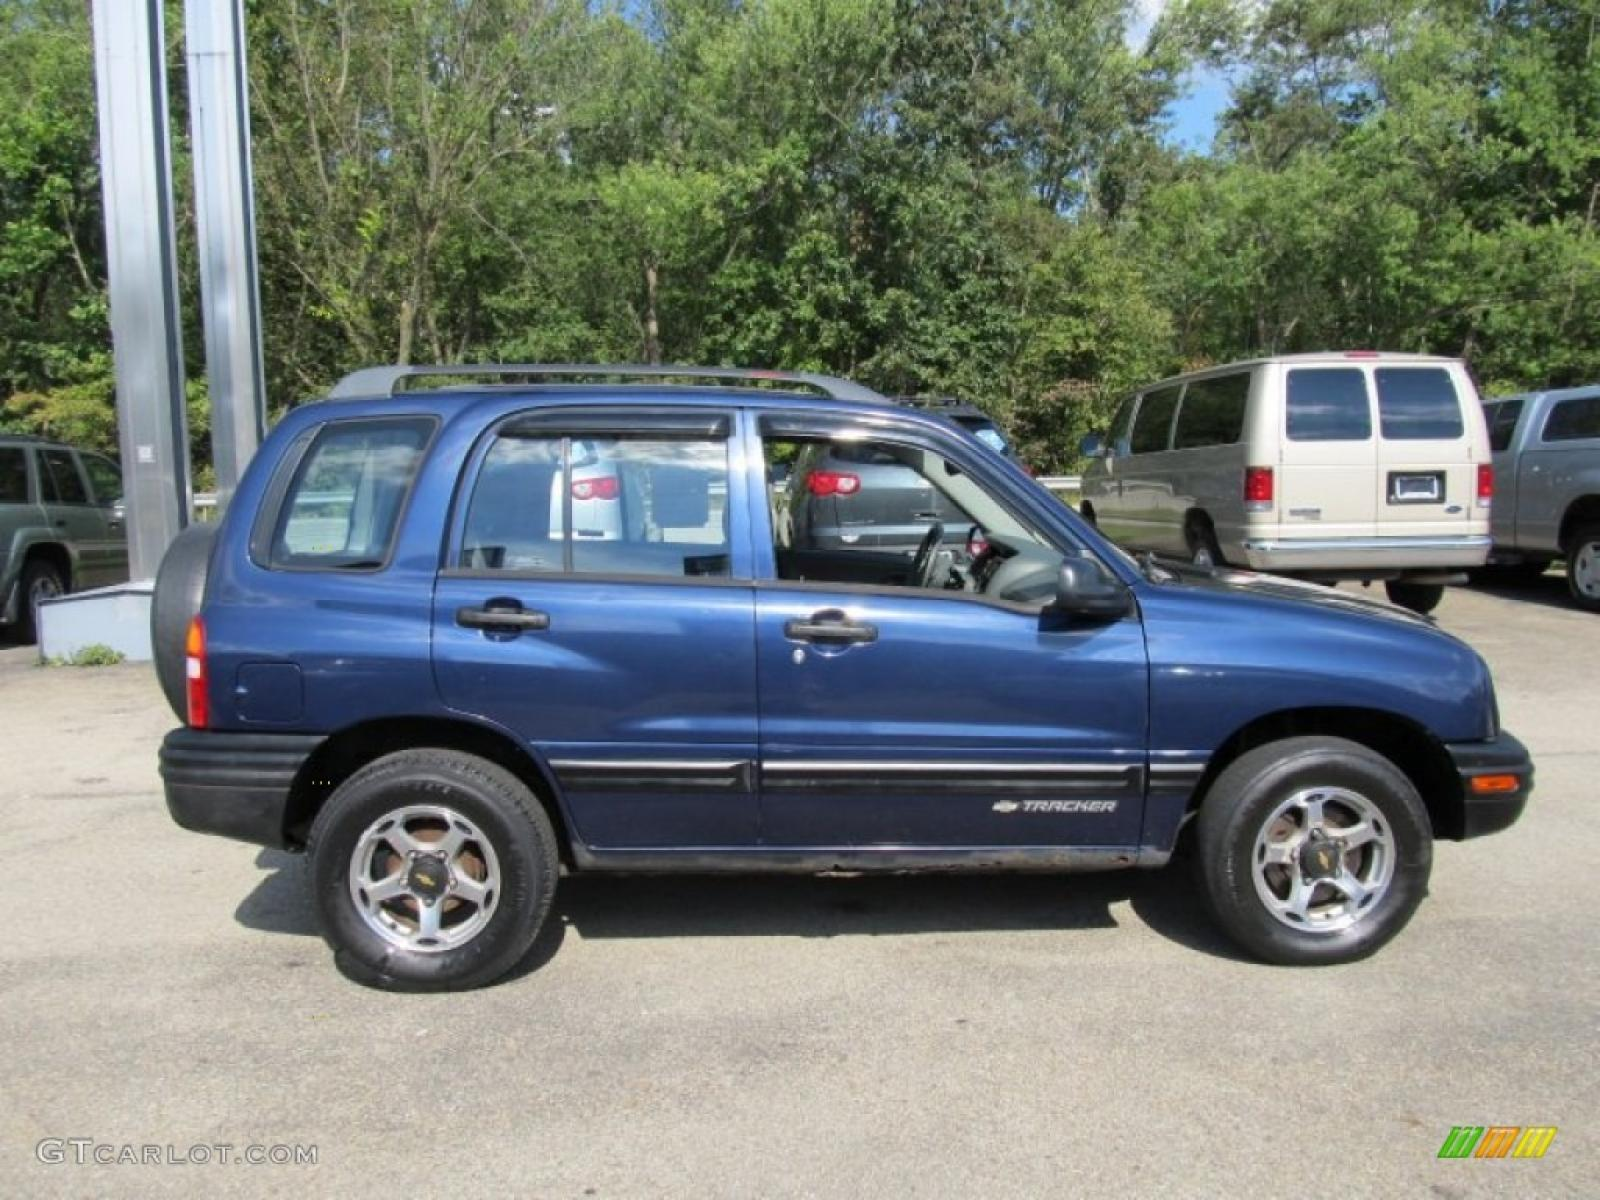 2000 Chevrolet Tracker #6 Chevrolet Tracker #6 800 1024 1280 1600 origin ...